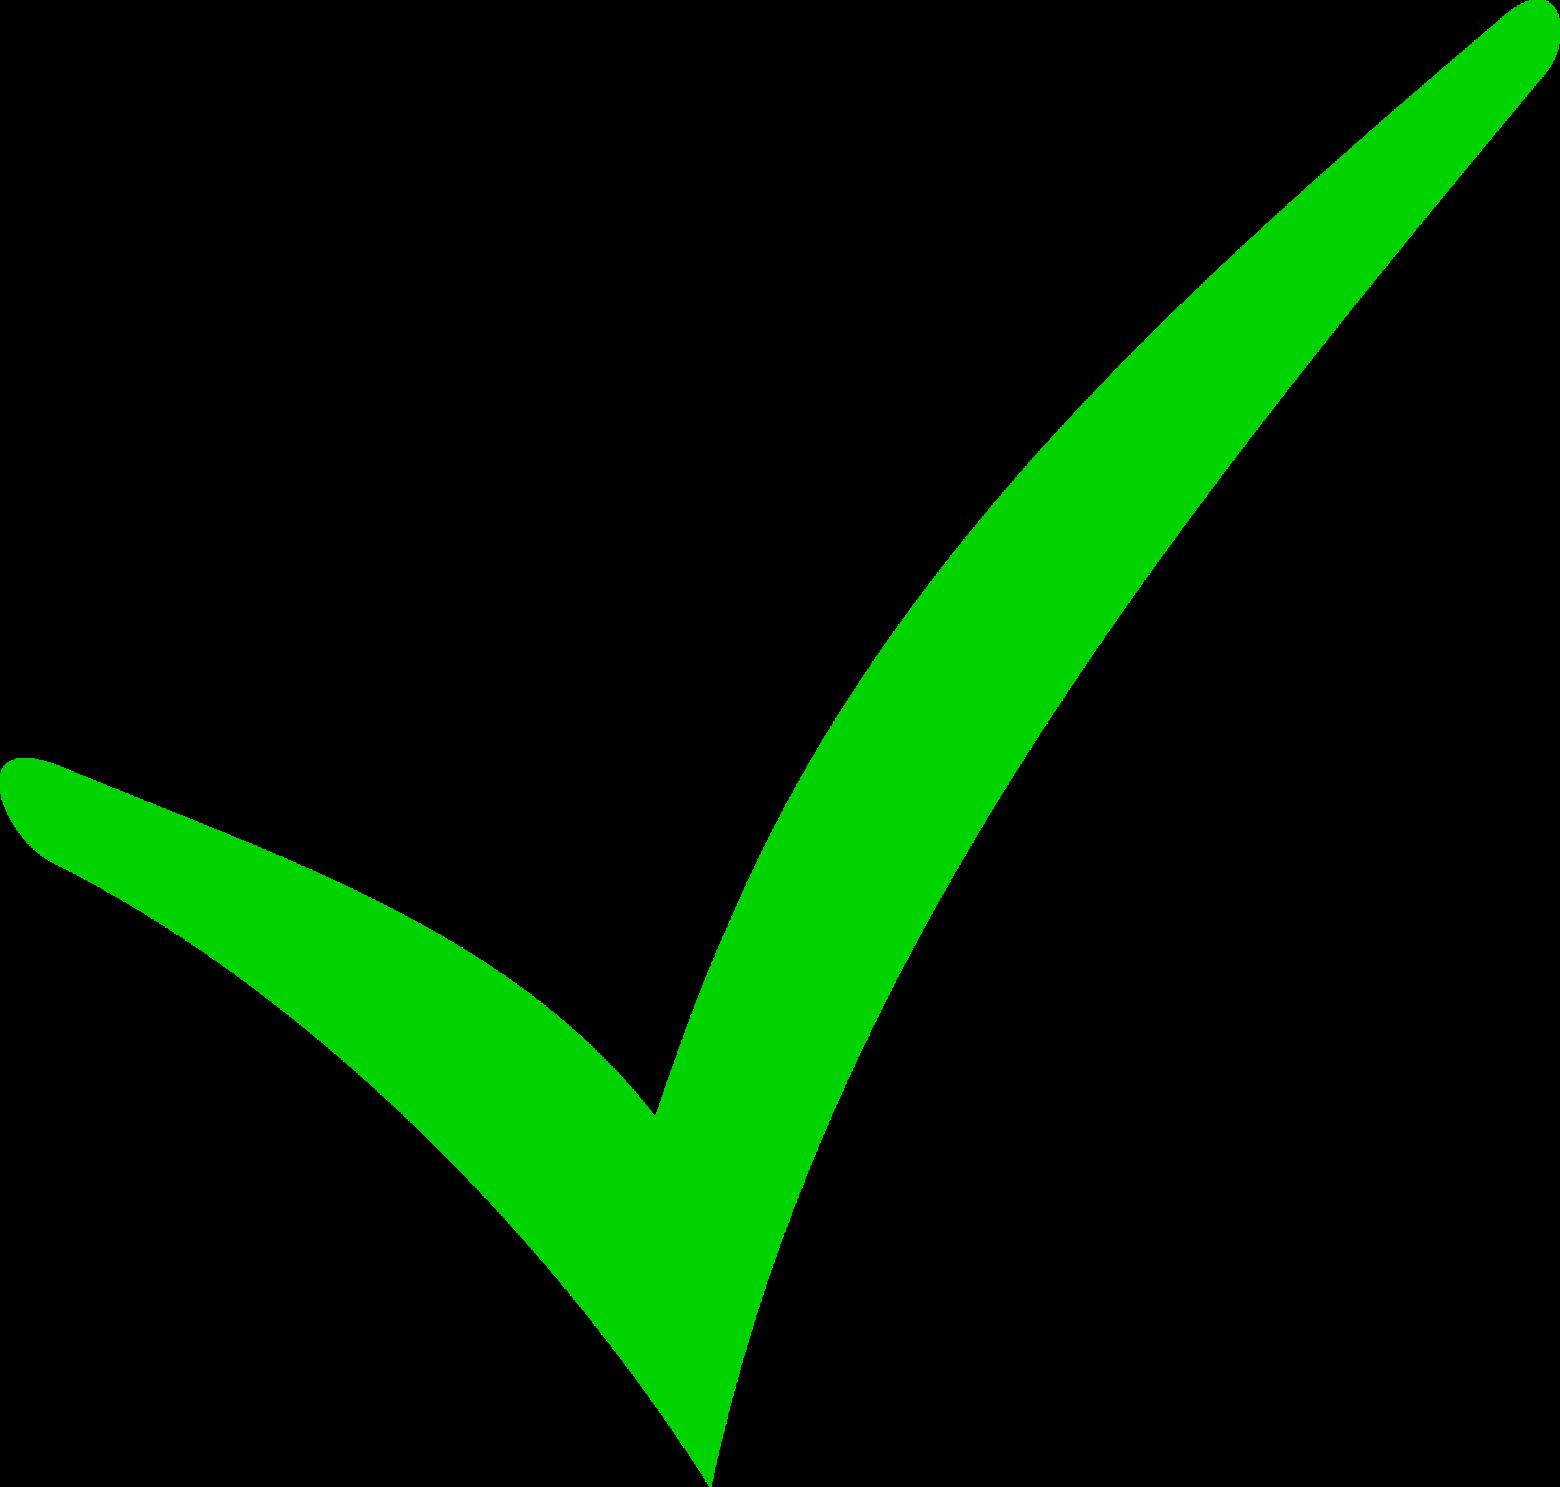 symbole vrai exact images gratuites et libres de droits clip art checking in clipart check mark symbol